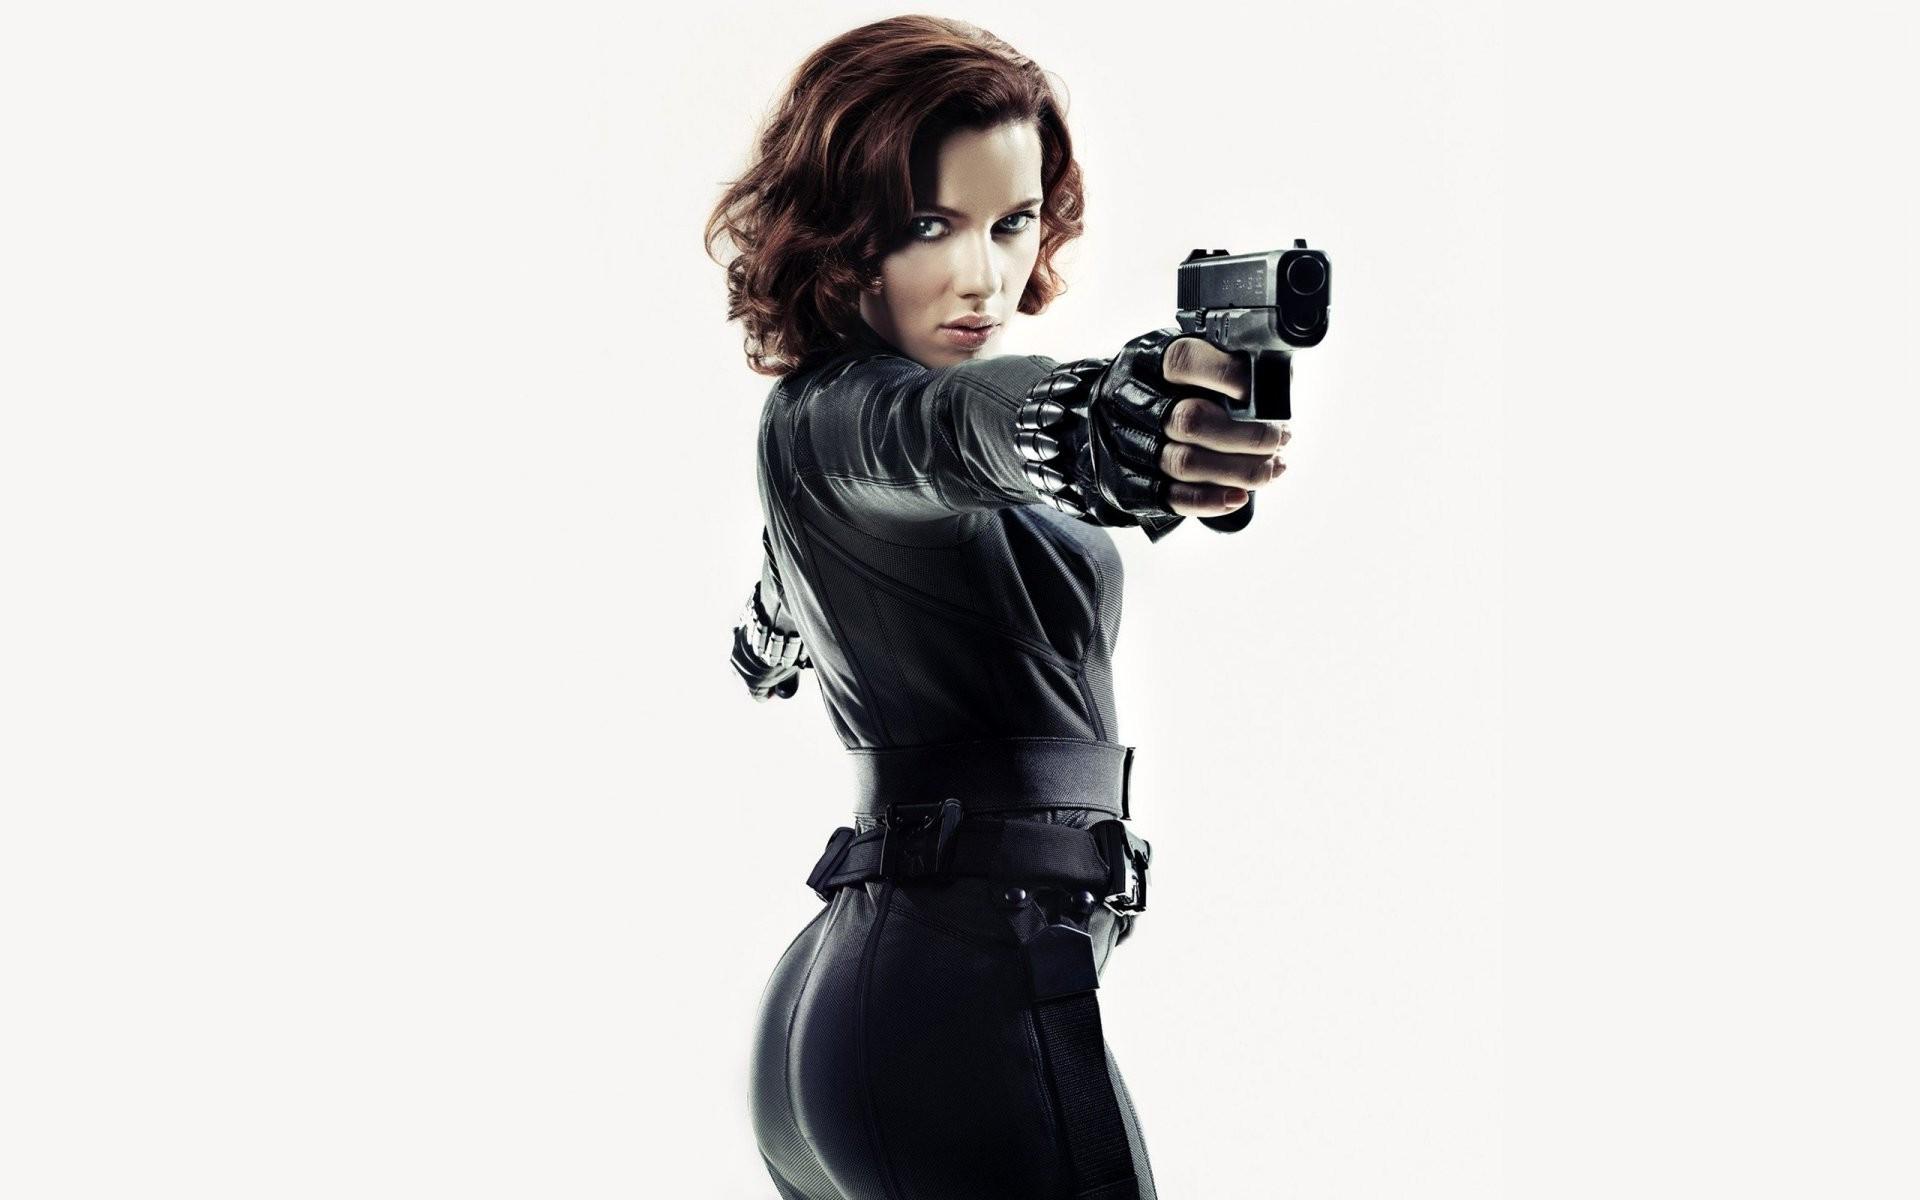 Black Widow Pictures